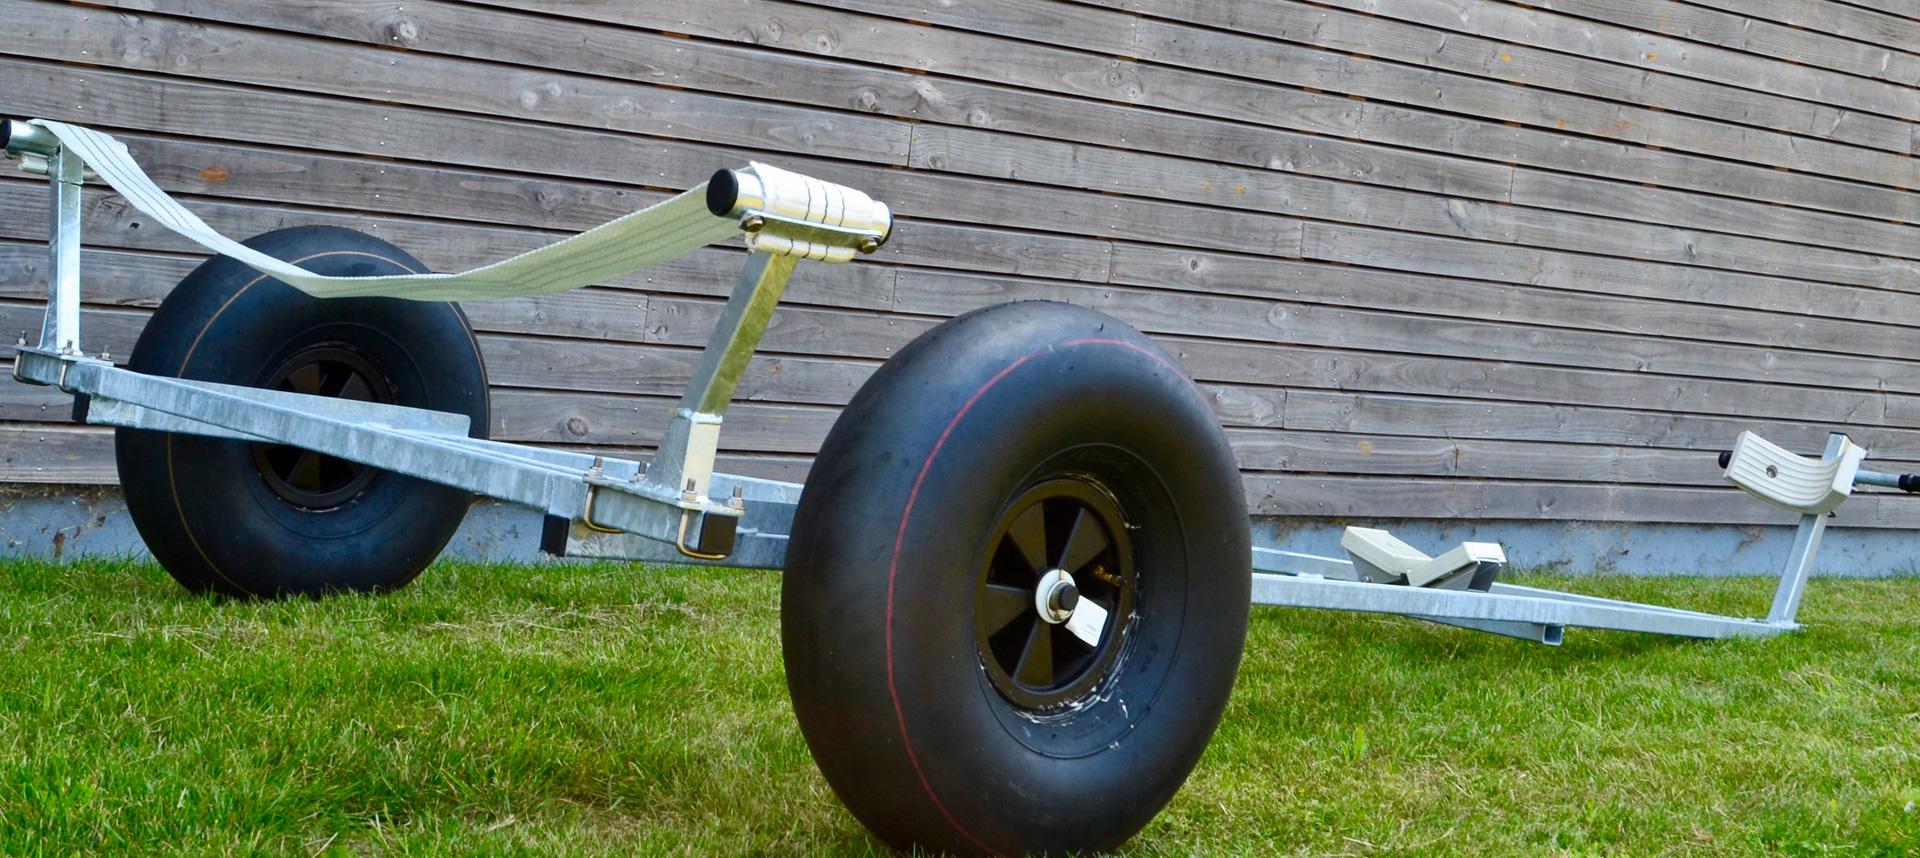 Epoh-remorques-Option-roues-ballon